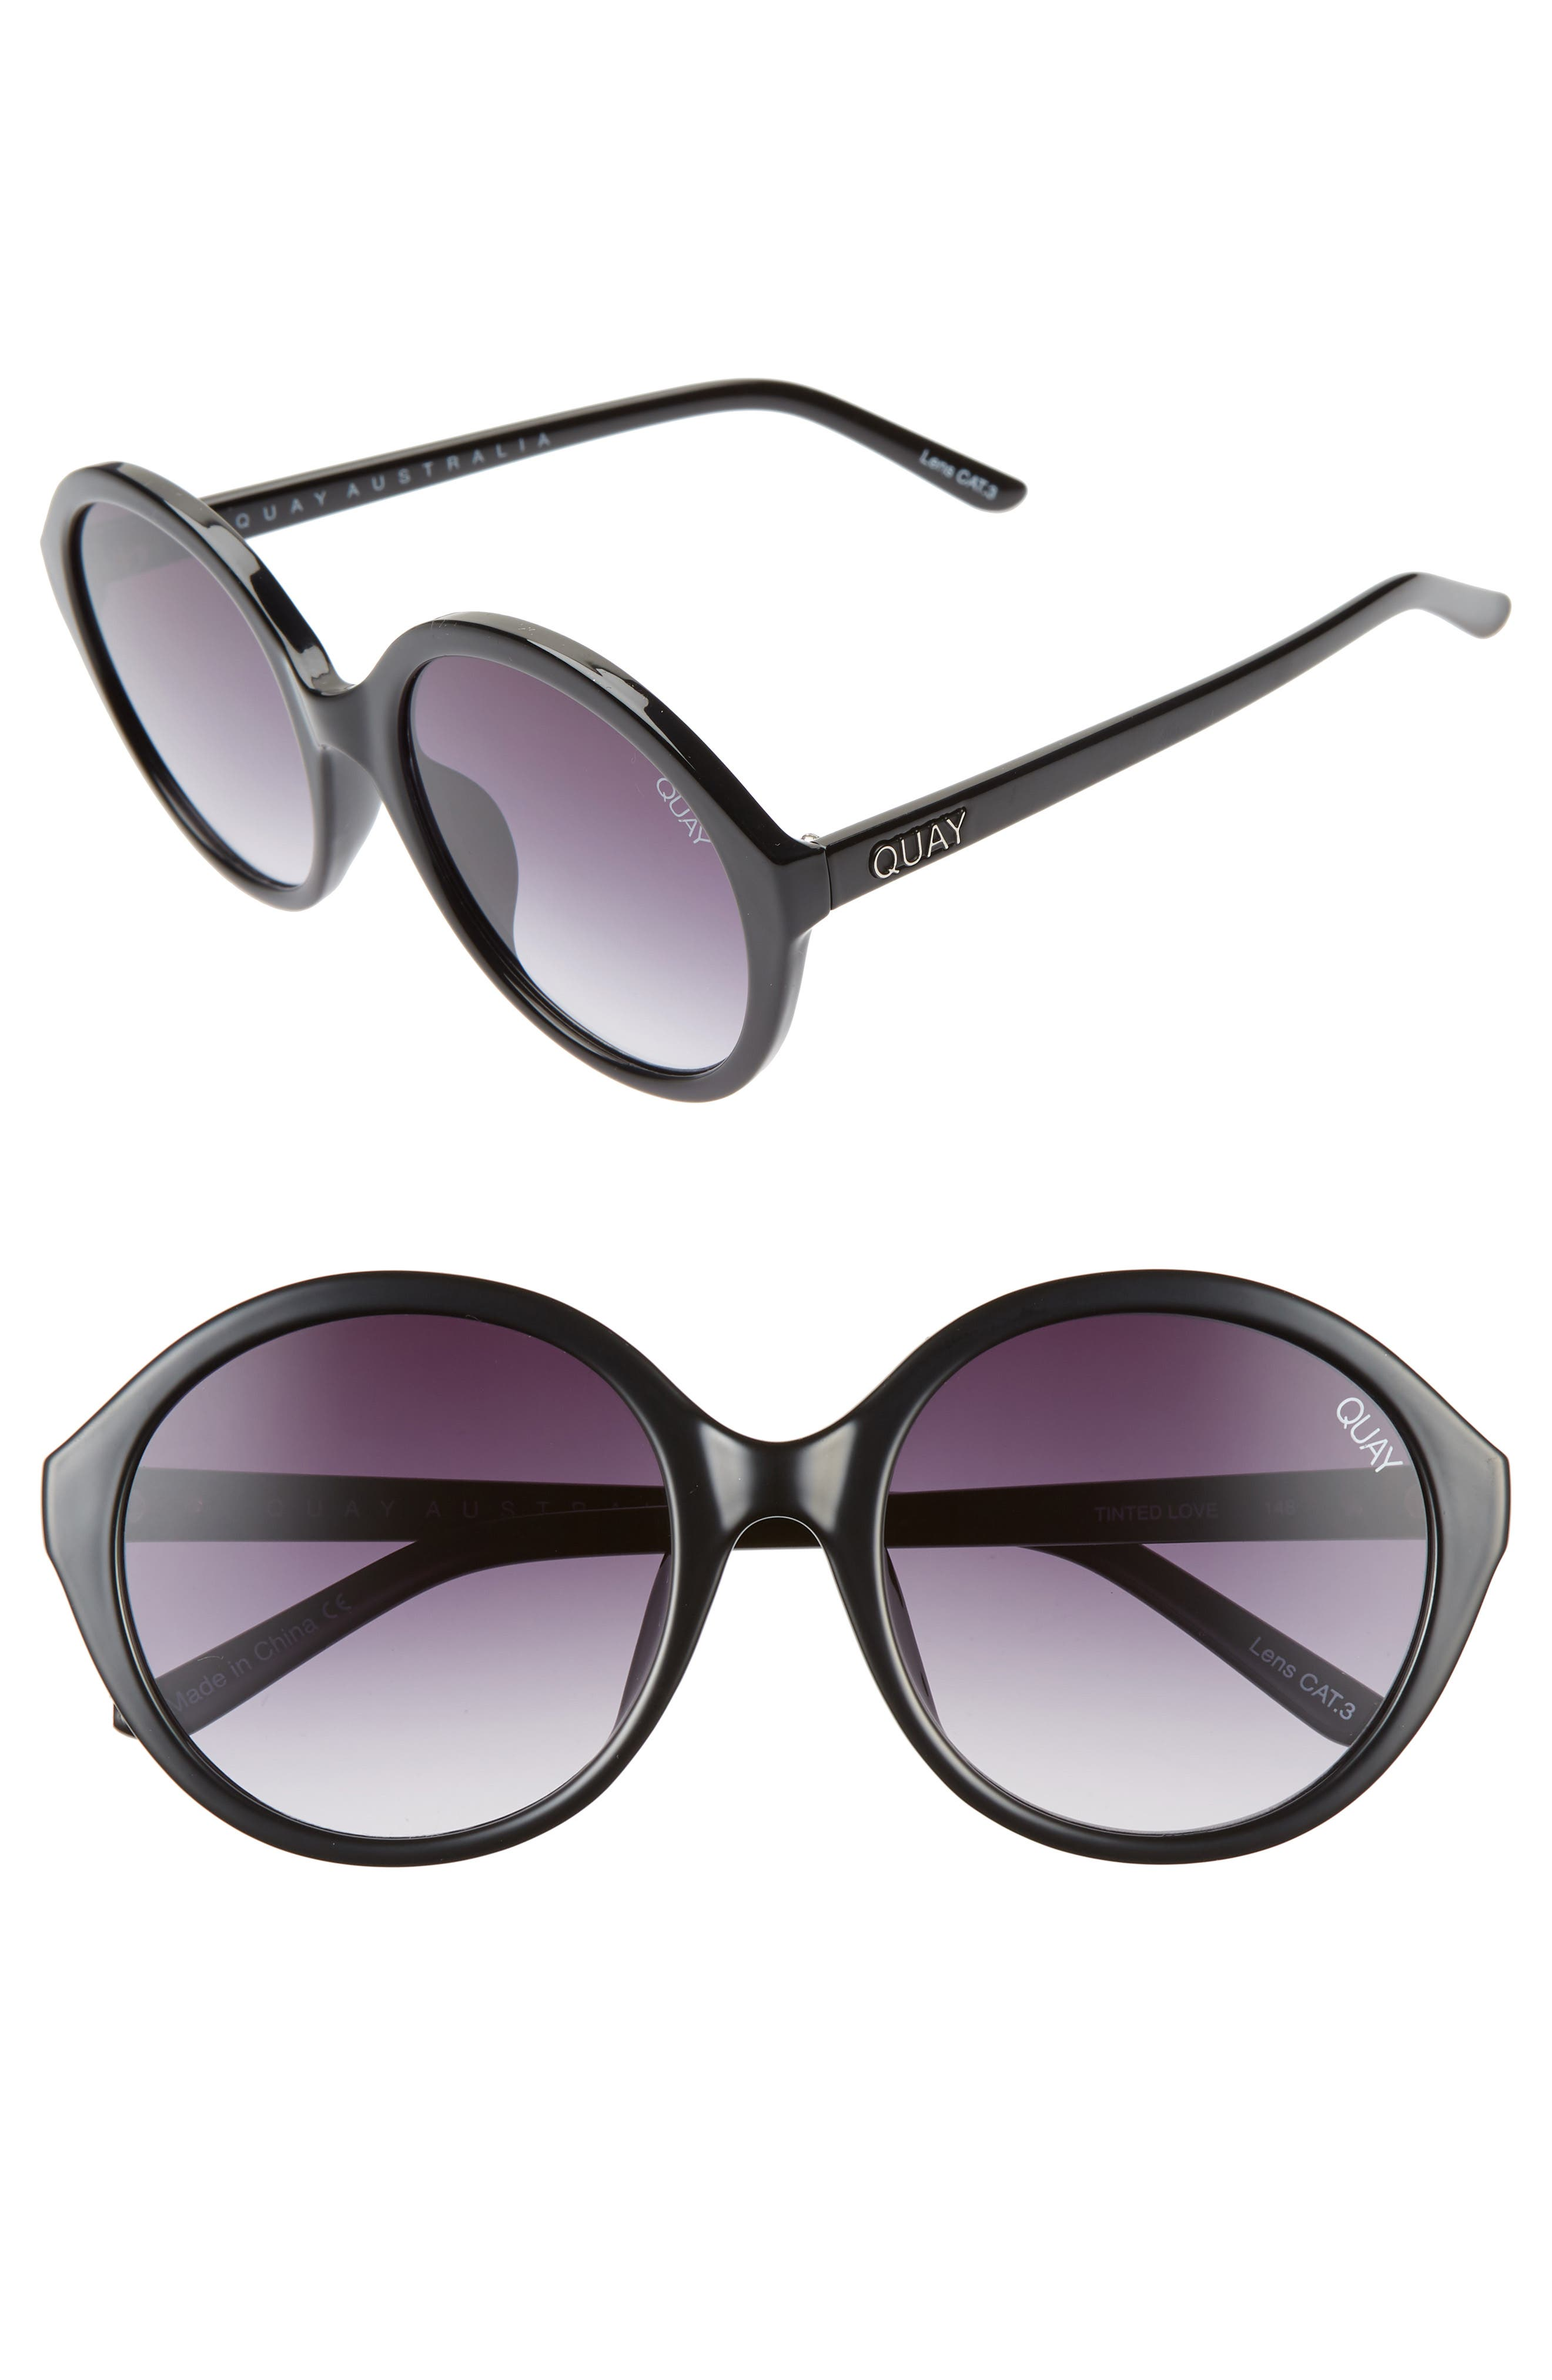 9c2b992bd11dd Quay Australia X Benefit Tinted Love 55Mm Round Sunglasses - Black  Smoke  Fade